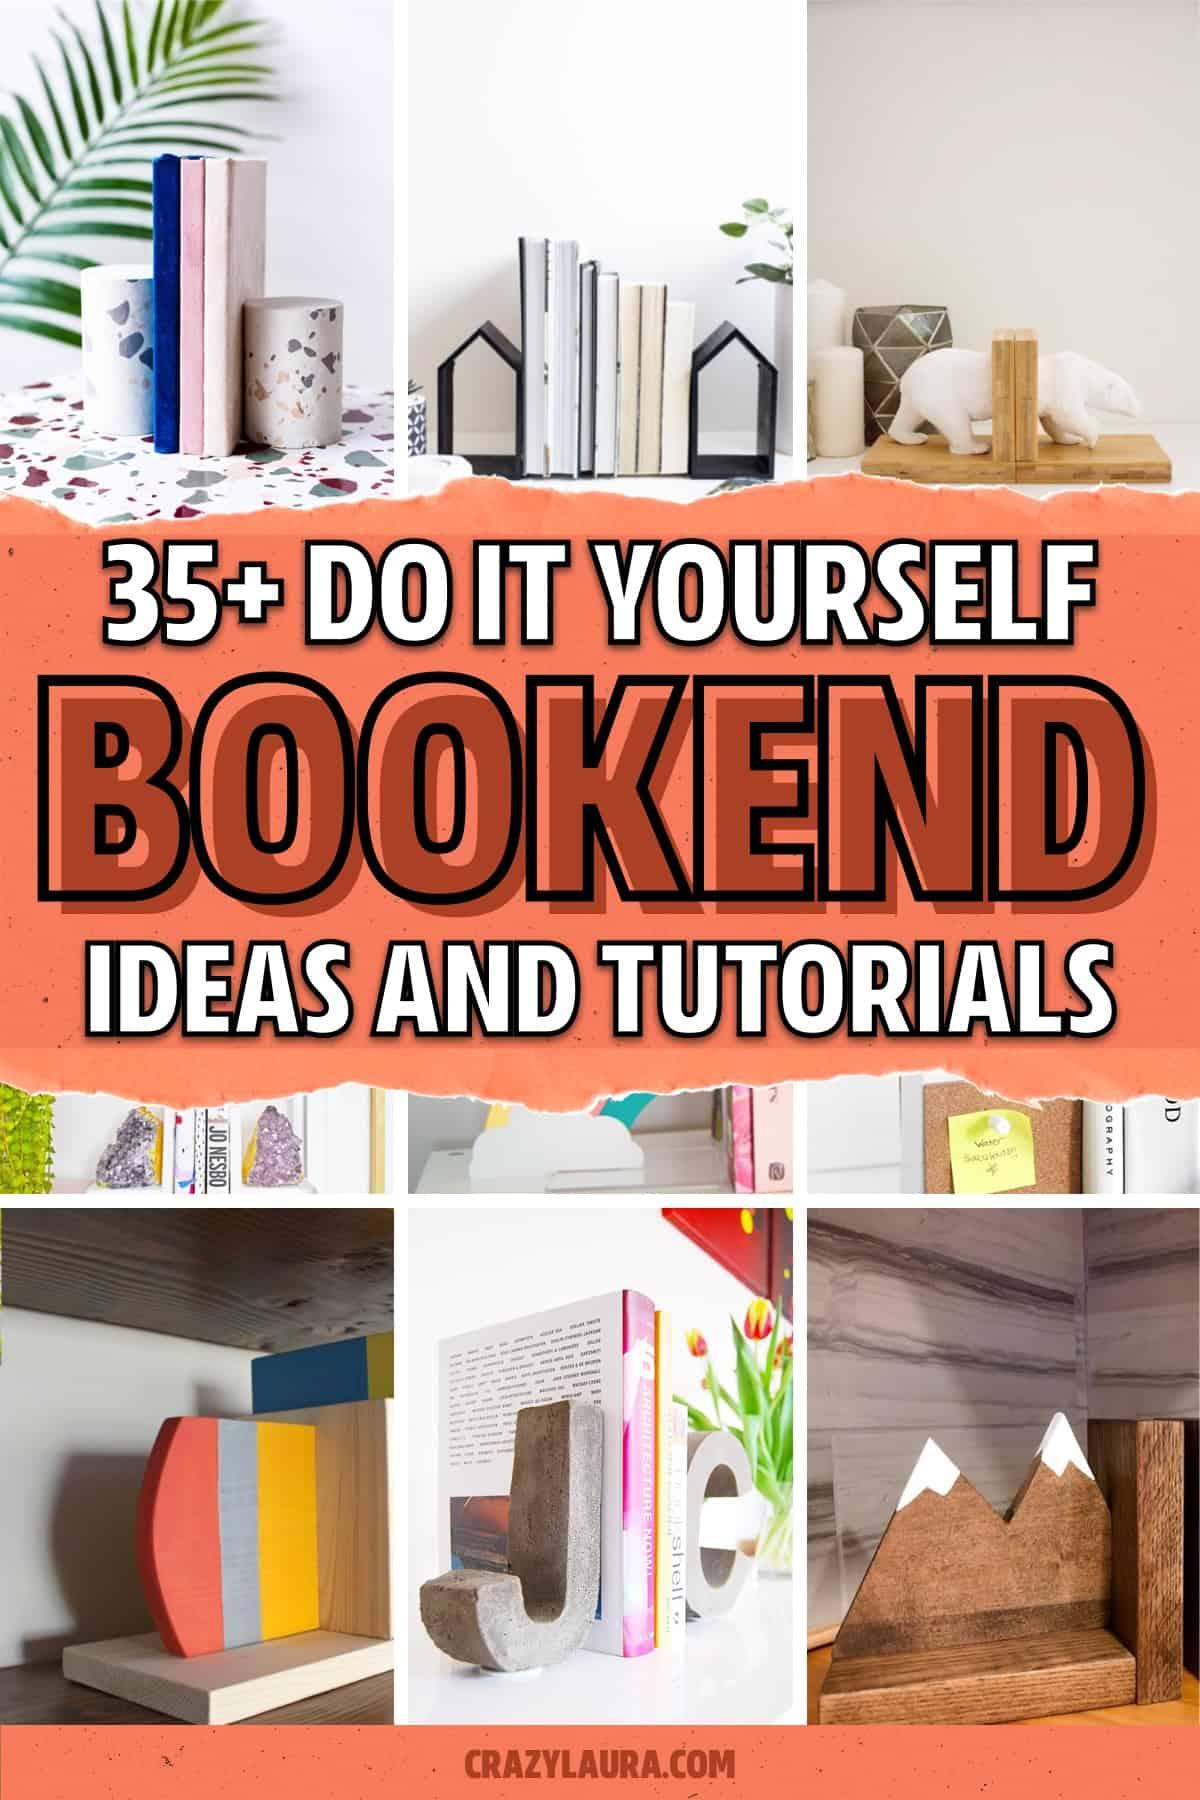 diy bookends ideas and tutorials